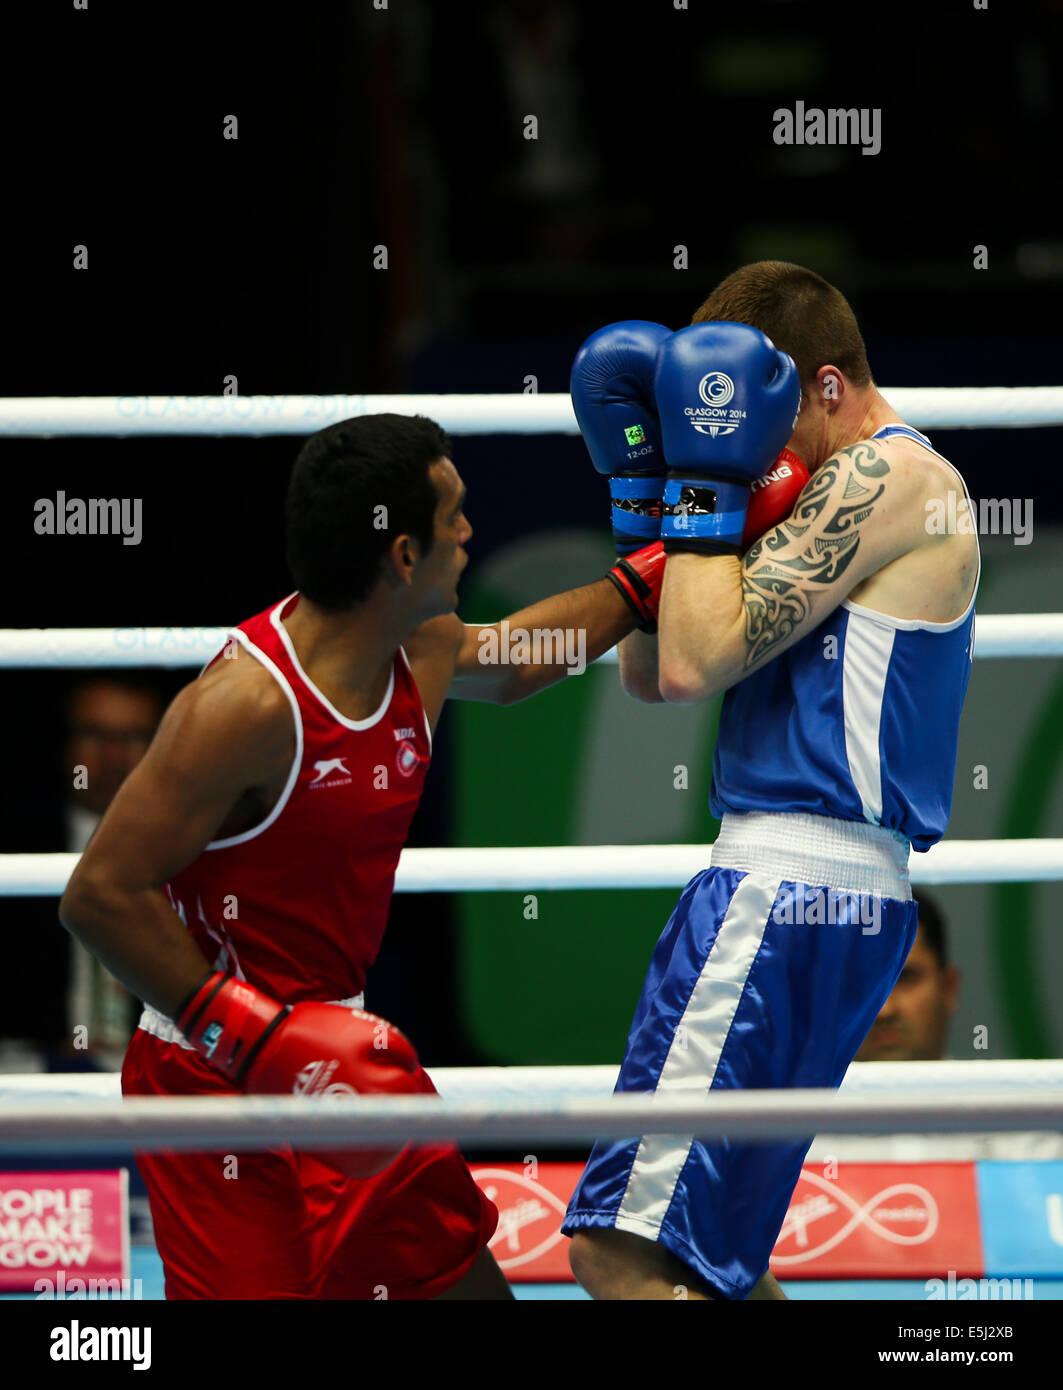 Scotstoun, Glasgow Scotland 1 Aug 2014. Day 9 Boxing semi-finals. Mandeep Jangra IND beats Steven Donnelly NIR Credit: - Stock Image